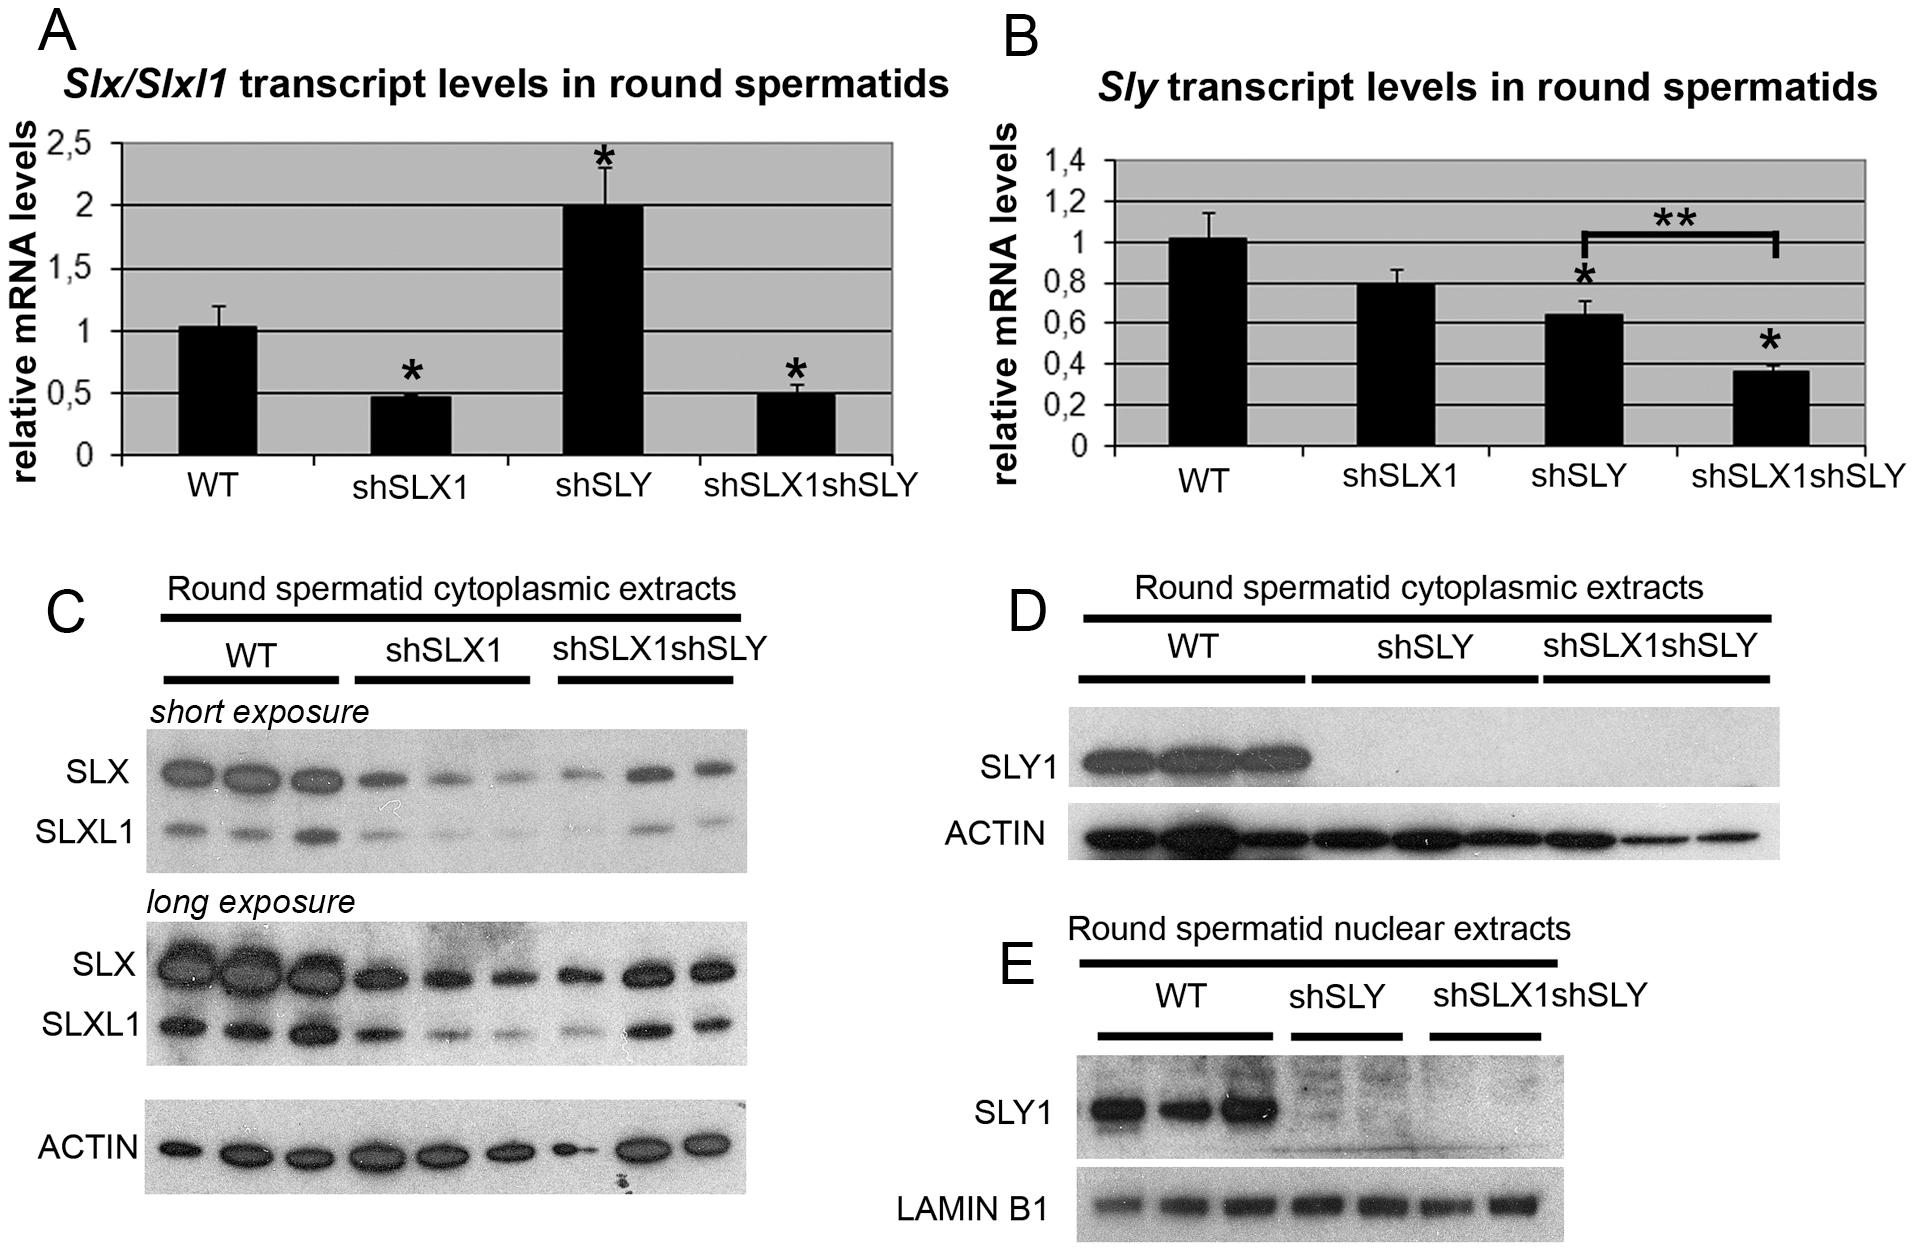 The combination of shSLX and shSLY transgenes produces an efficient knockdown of <i>Slx/Slxl1</i> and <i>Sly</i> genes.